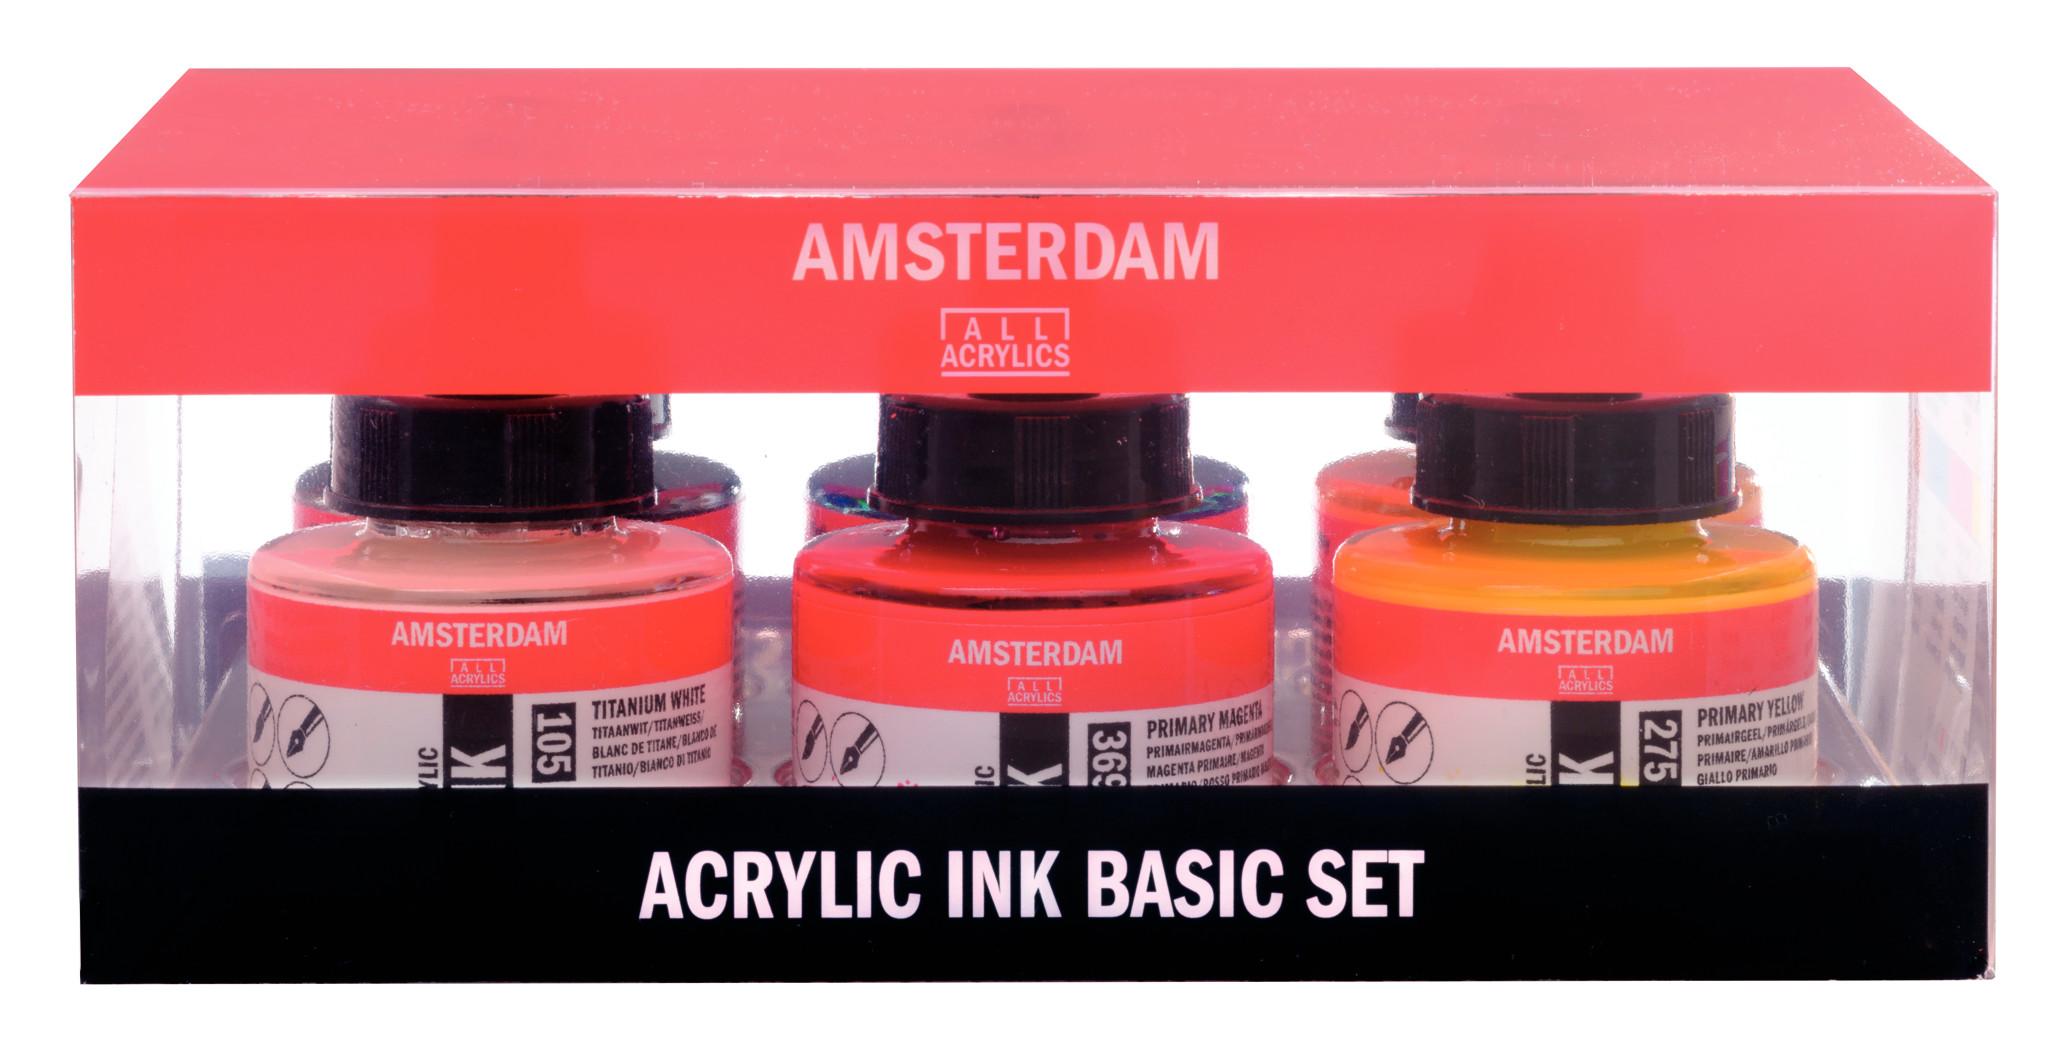 Amsterdam Acrylic Ink Basic Set - 6 x 30 ml